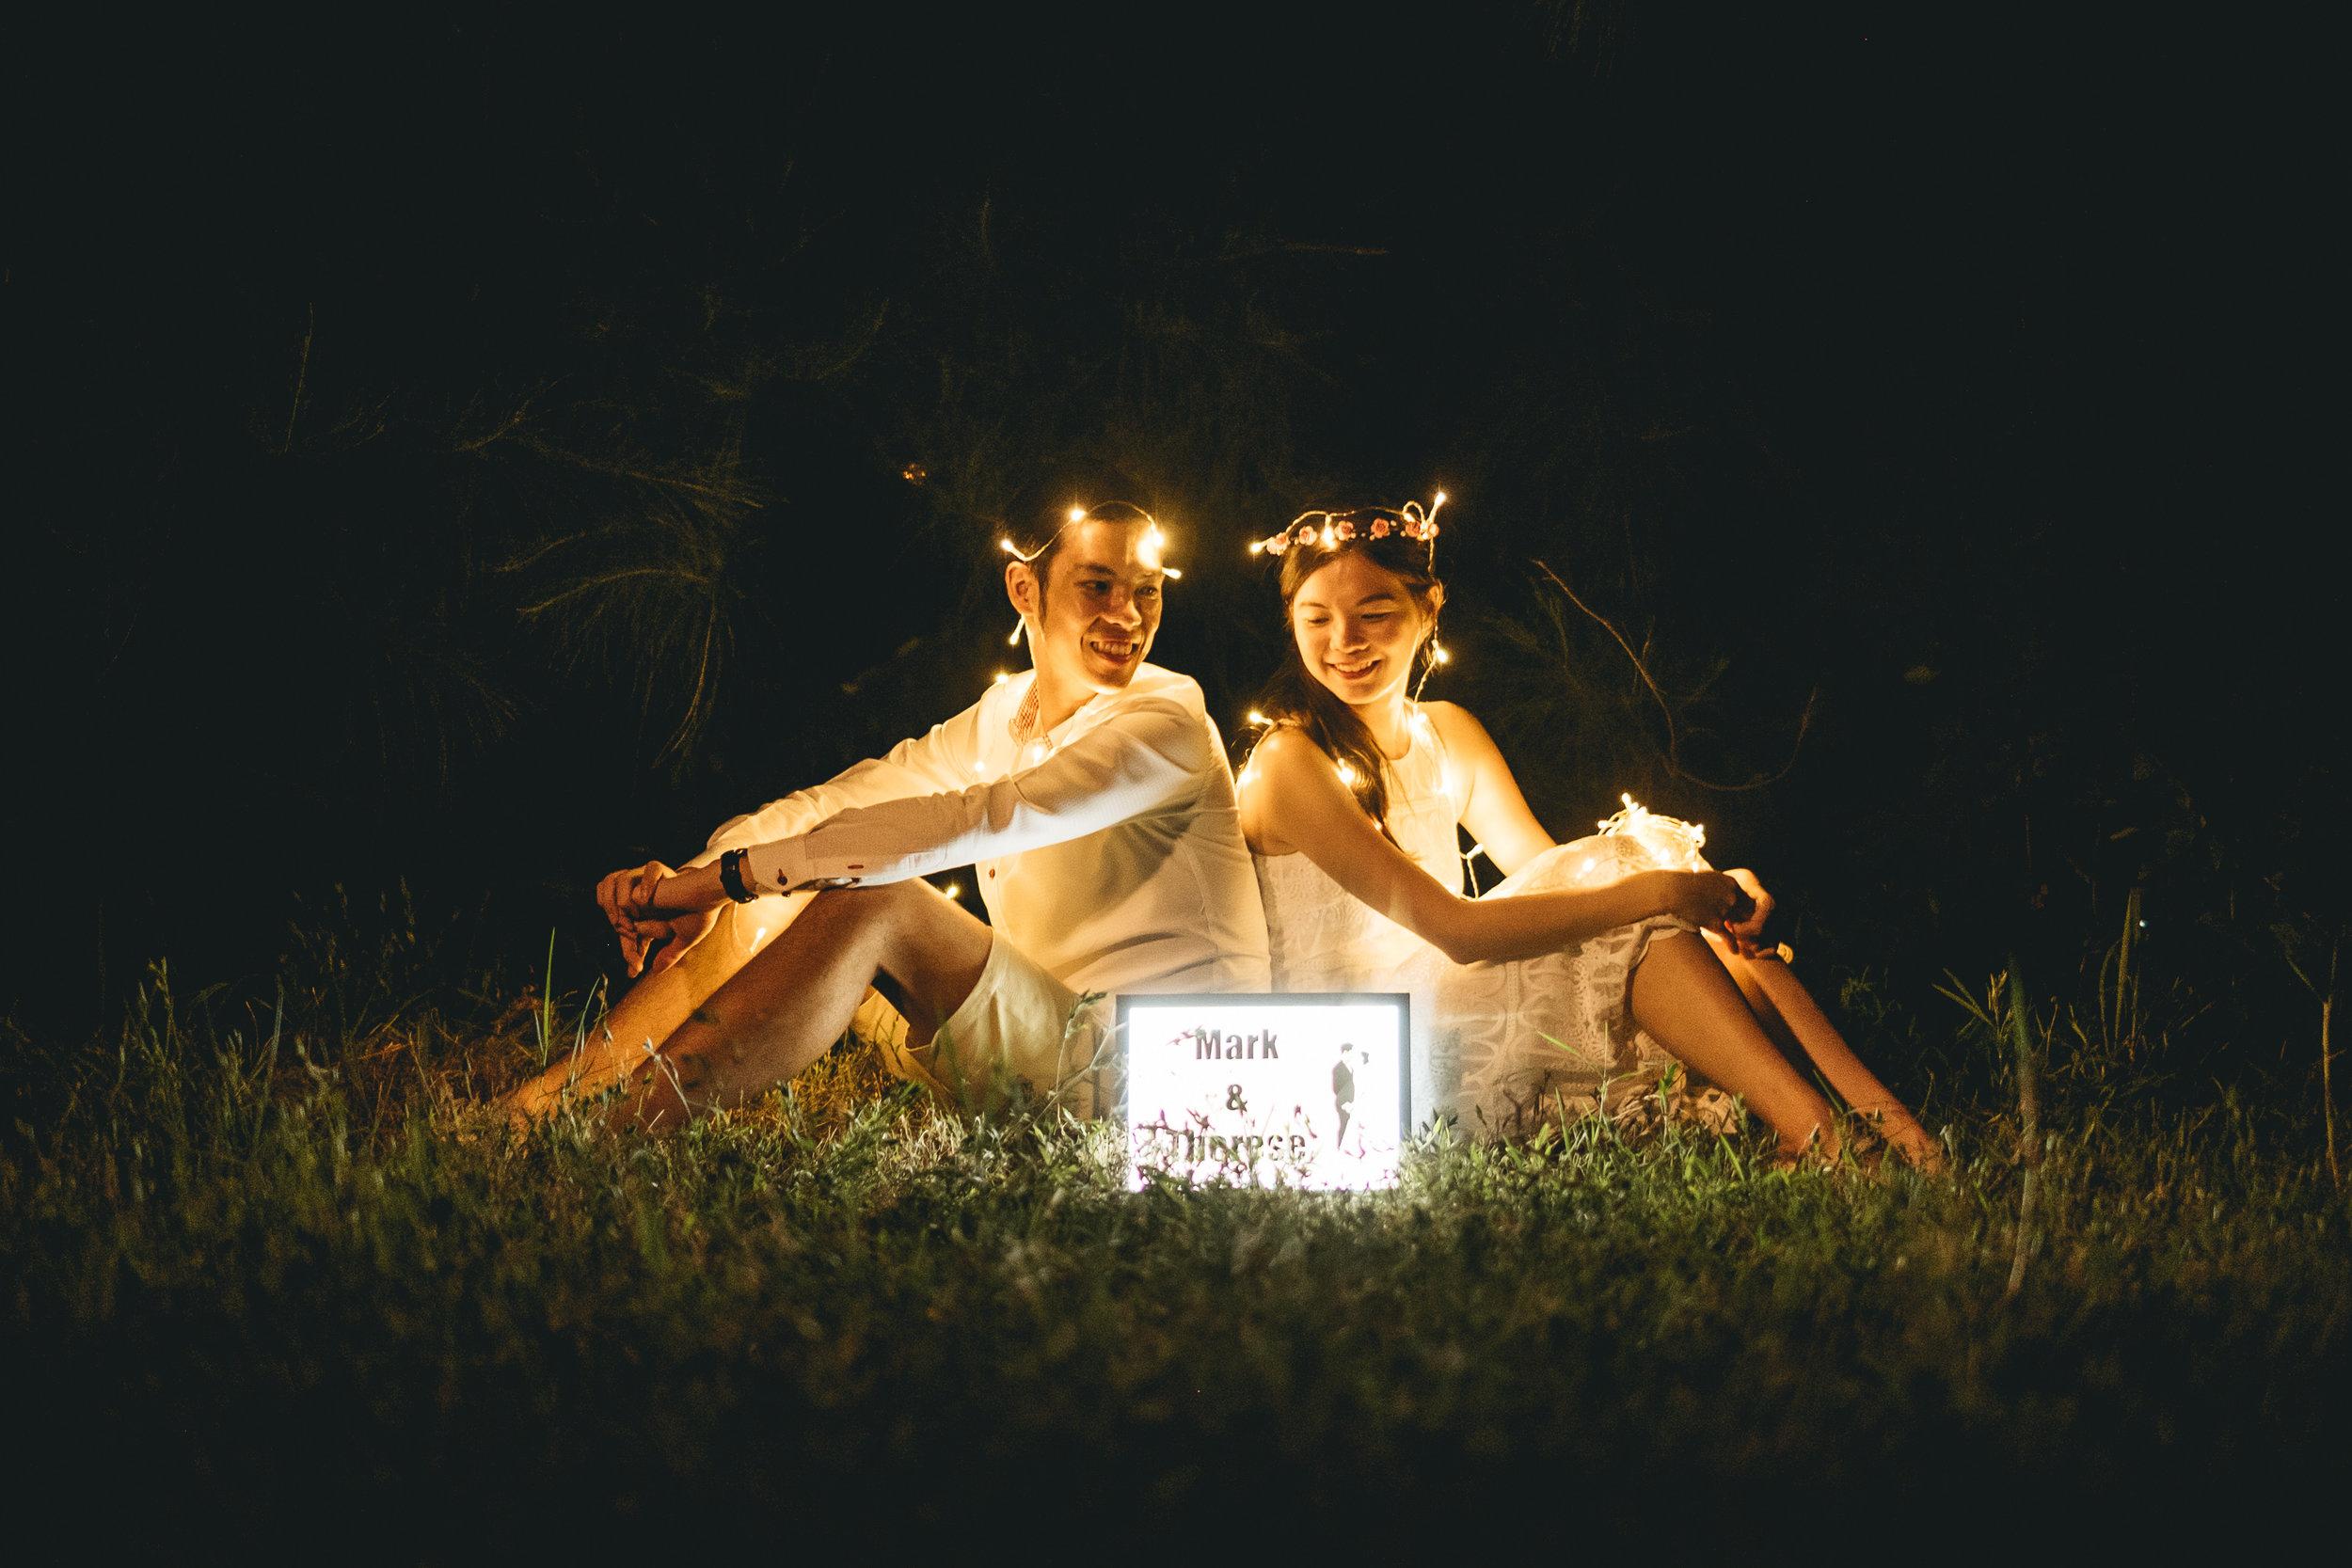 Juxtapose Pix - Pre-Wedding - Mark & Therese - Tuas Sunset 00015.jpg